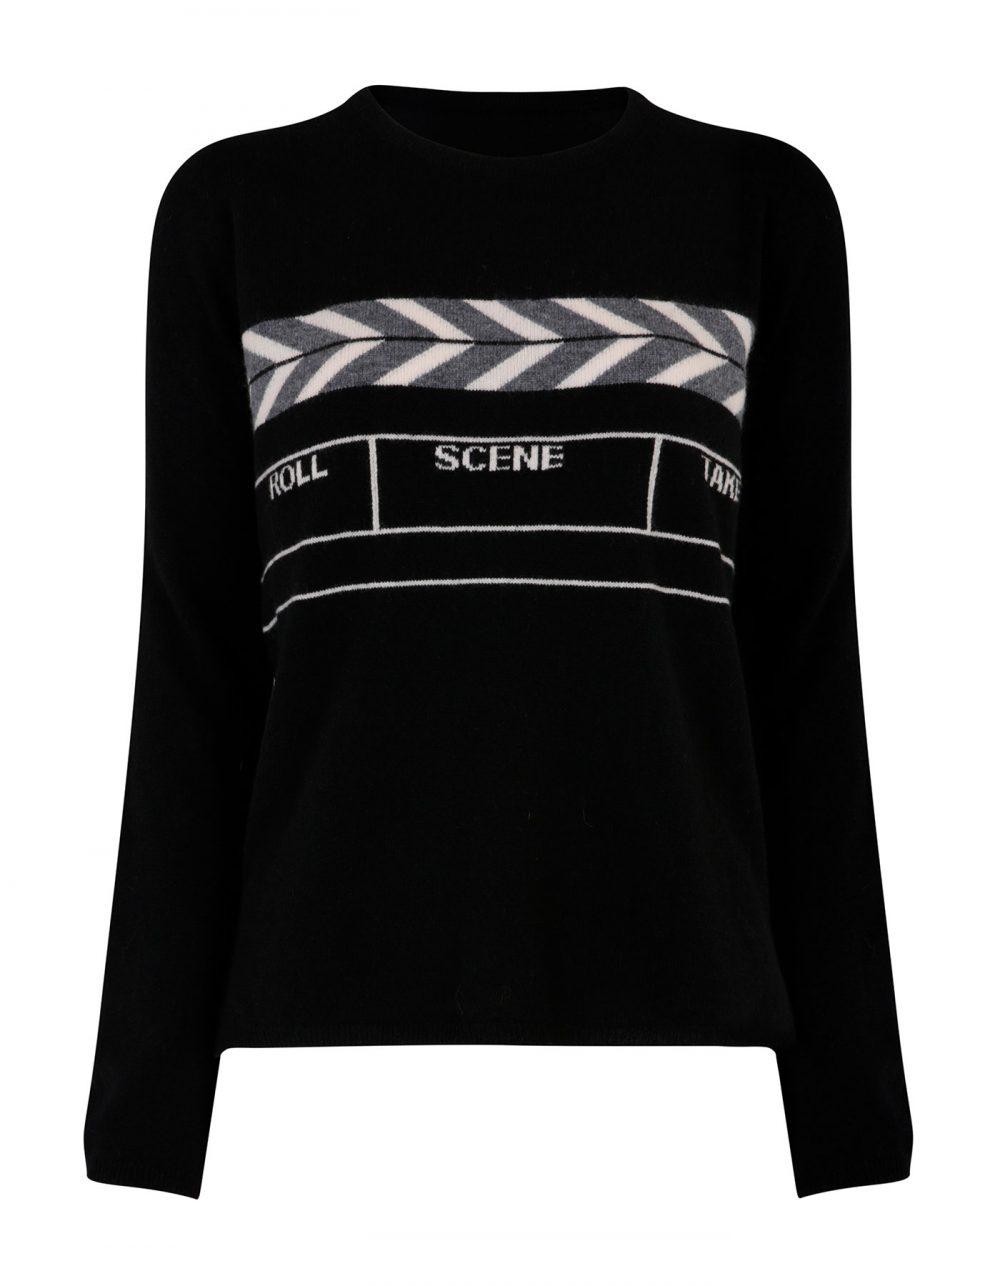 Designer knitwear, a malin darlin Scene womens cashmere jumper, laid flat on a white background.